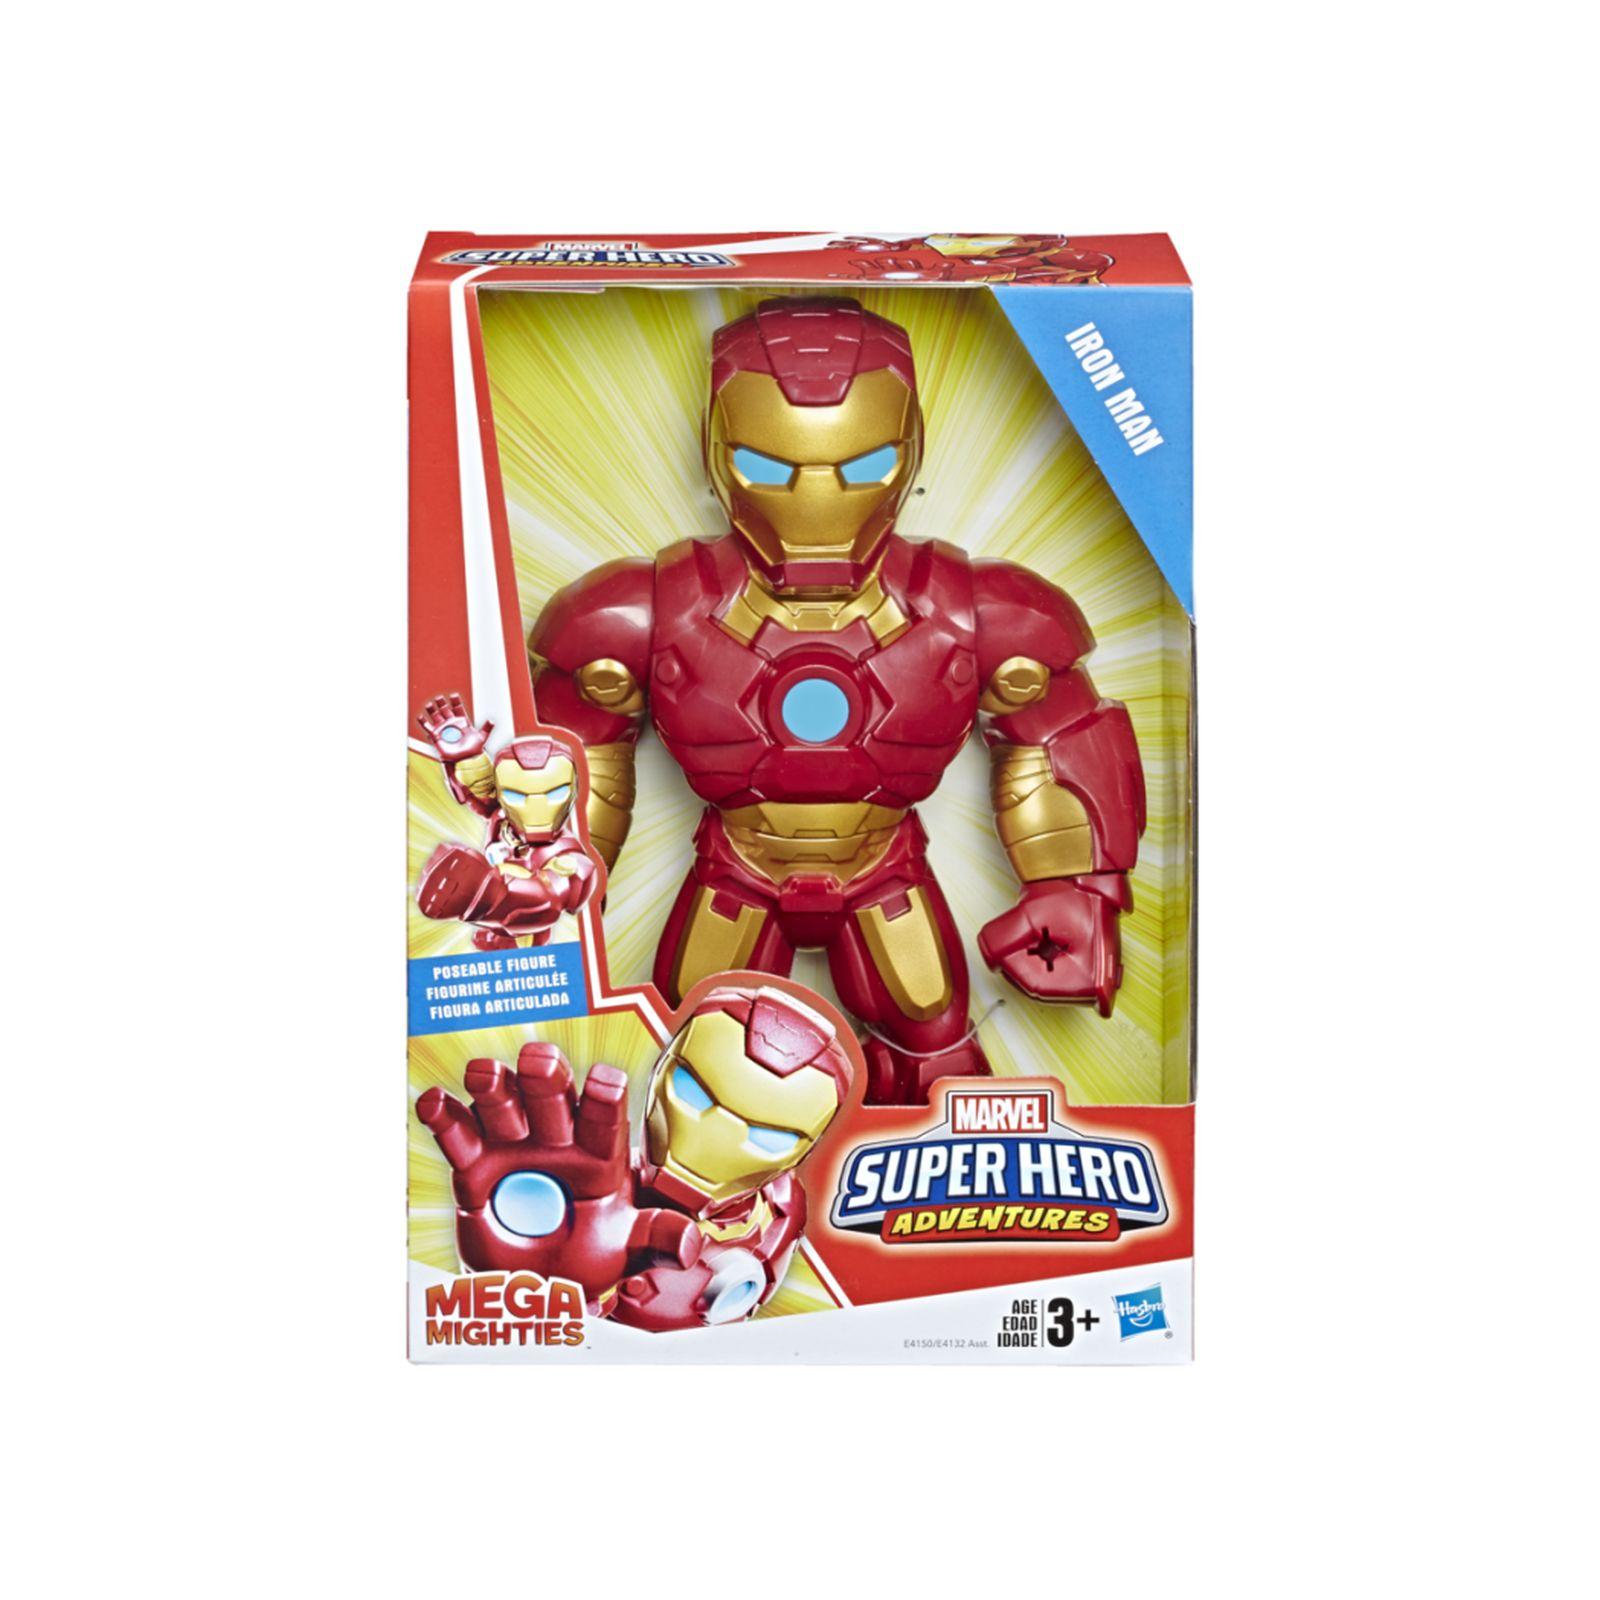 Marvel super hero adventures - iron man mega mighties (action figure da 25 cm) - MARVEL SUPER HERO ADVENTURE